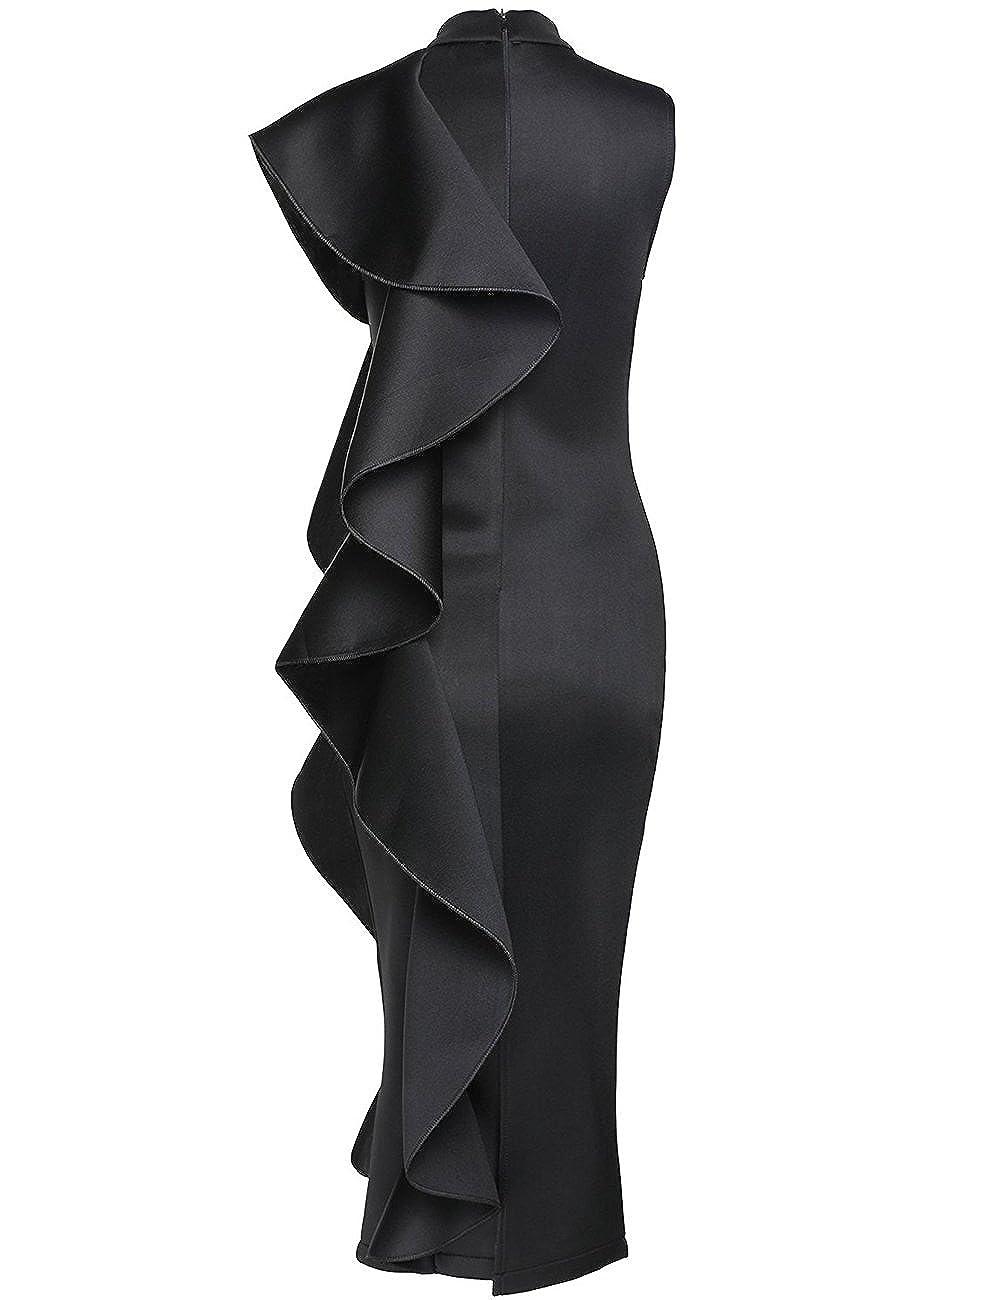 3b6e668da003 Maketina Womens Ruffle Patchwork Sleeveless High Neck Bodycon Elegant Midi  Party Dress at Amazon Women's Clothing store: